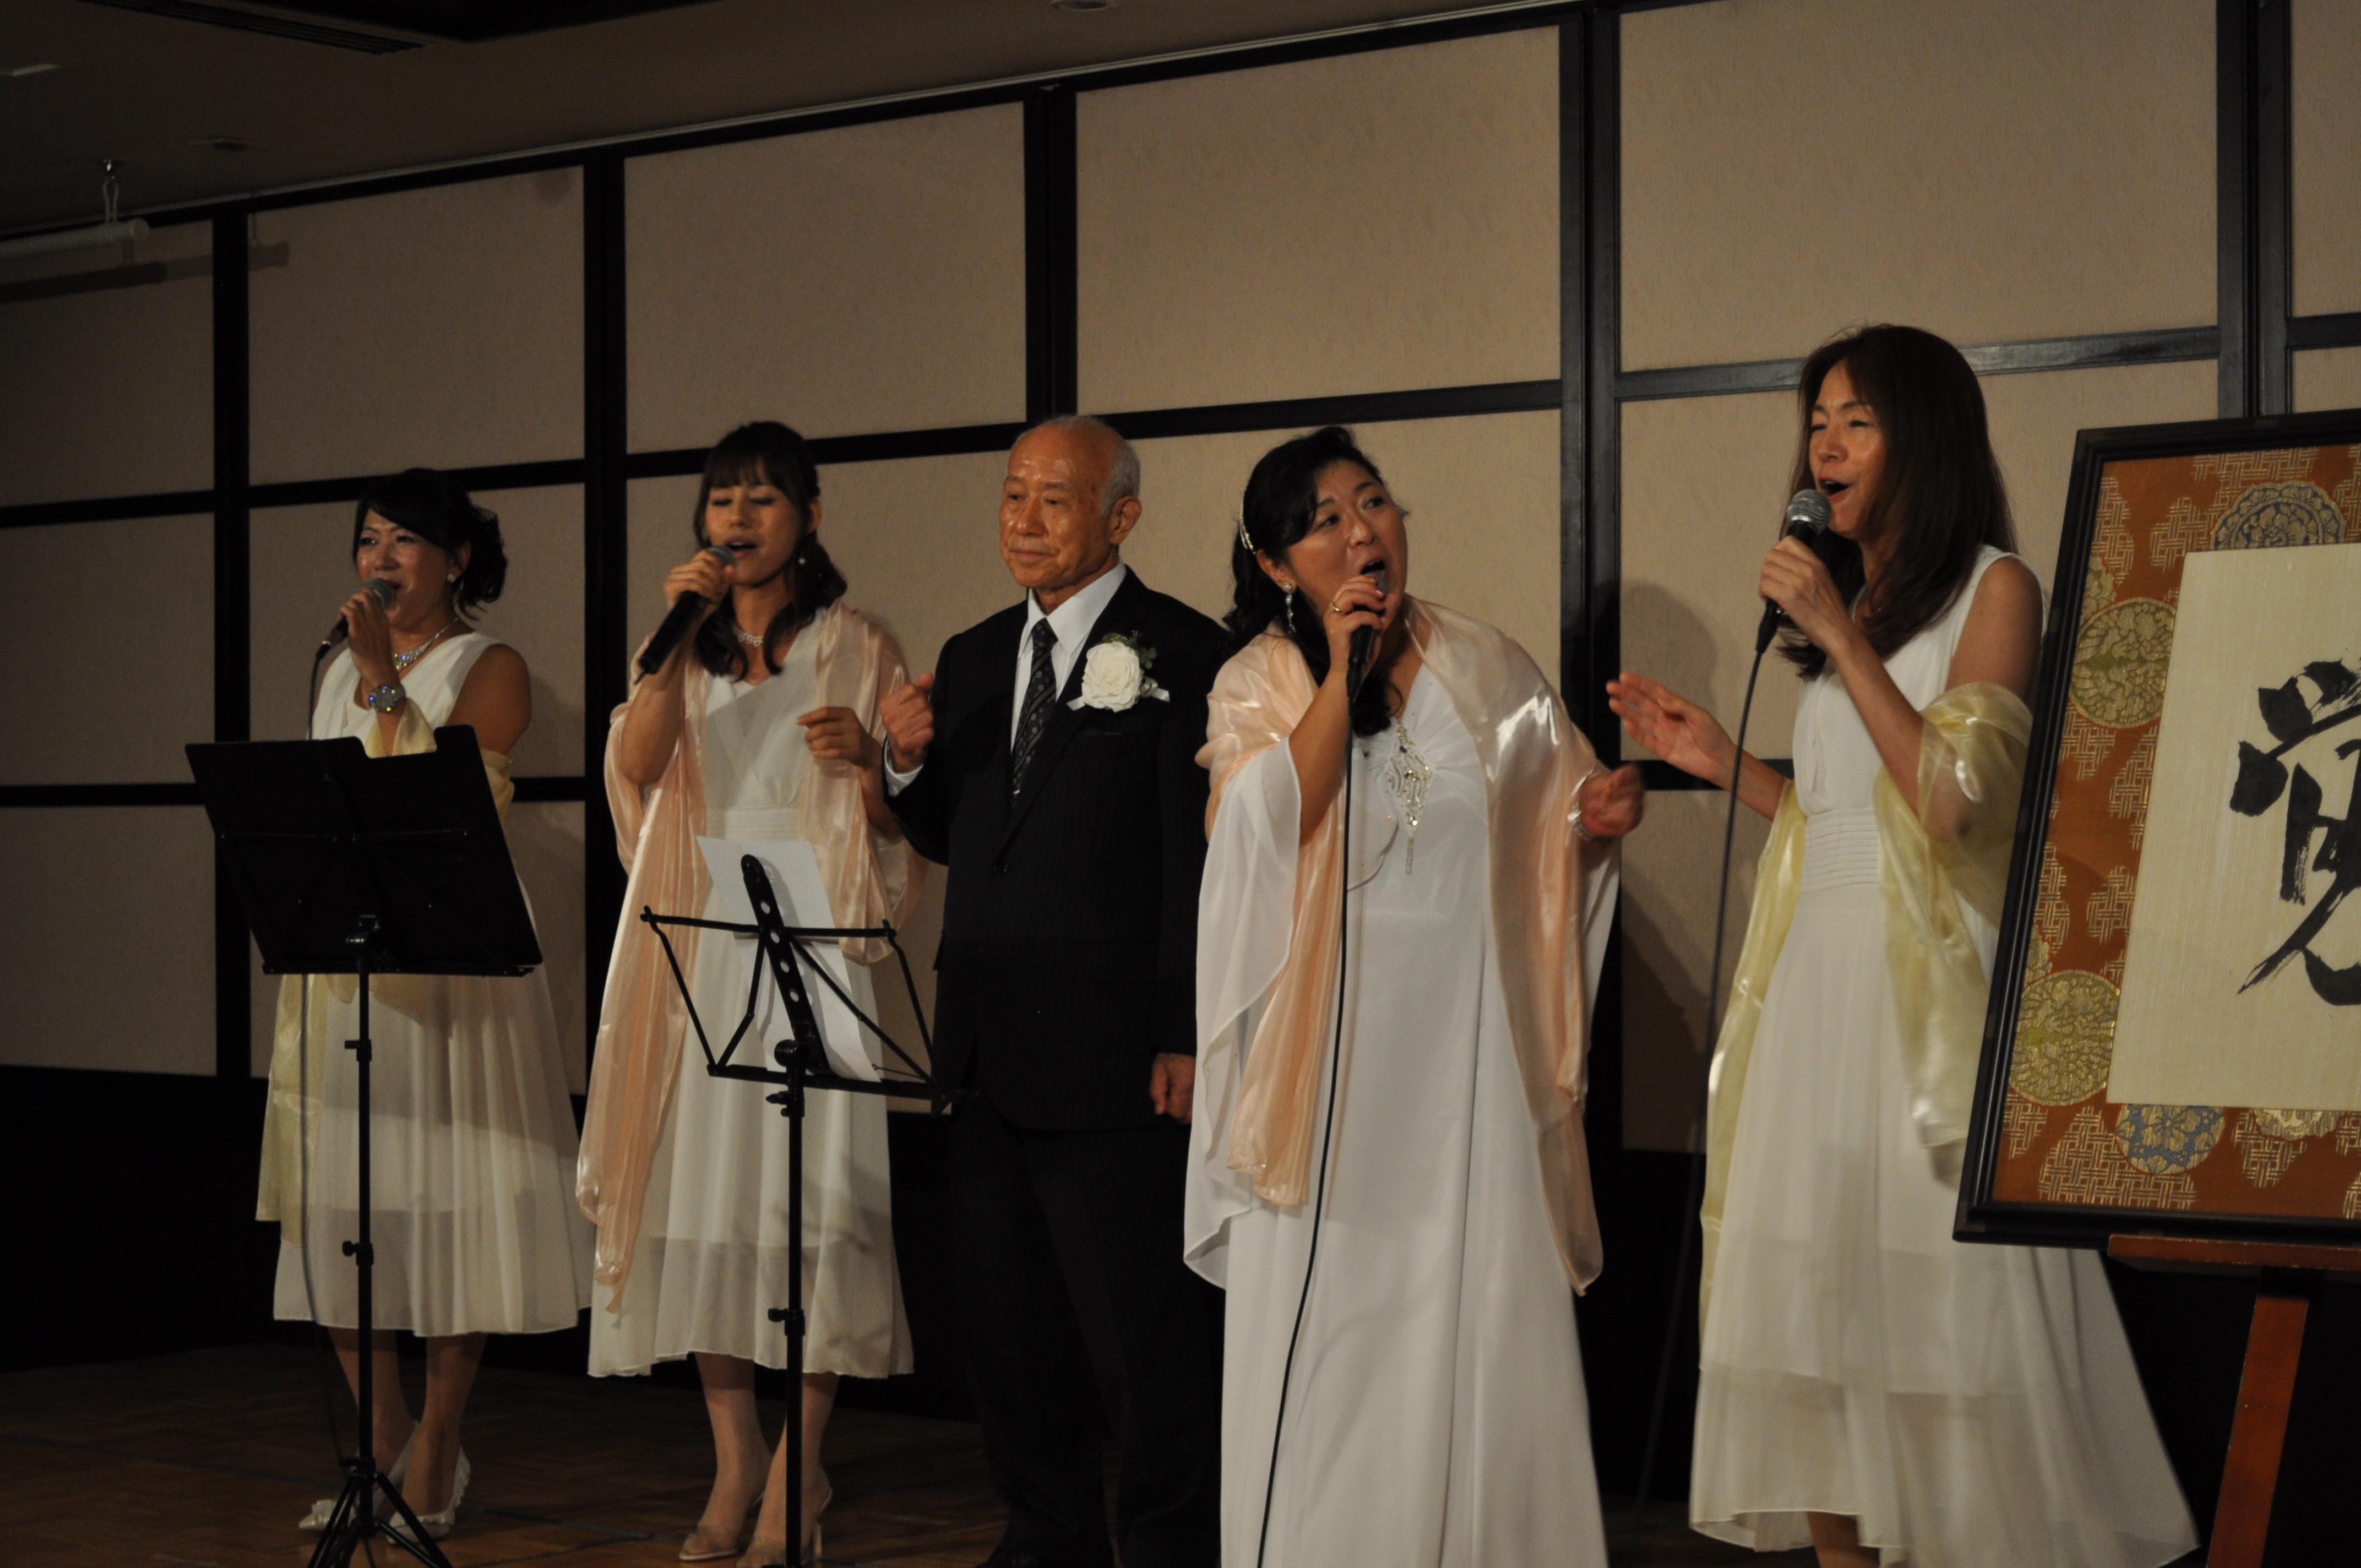 DSC 0529 - 第6回思風会全国大会2018in東京開催